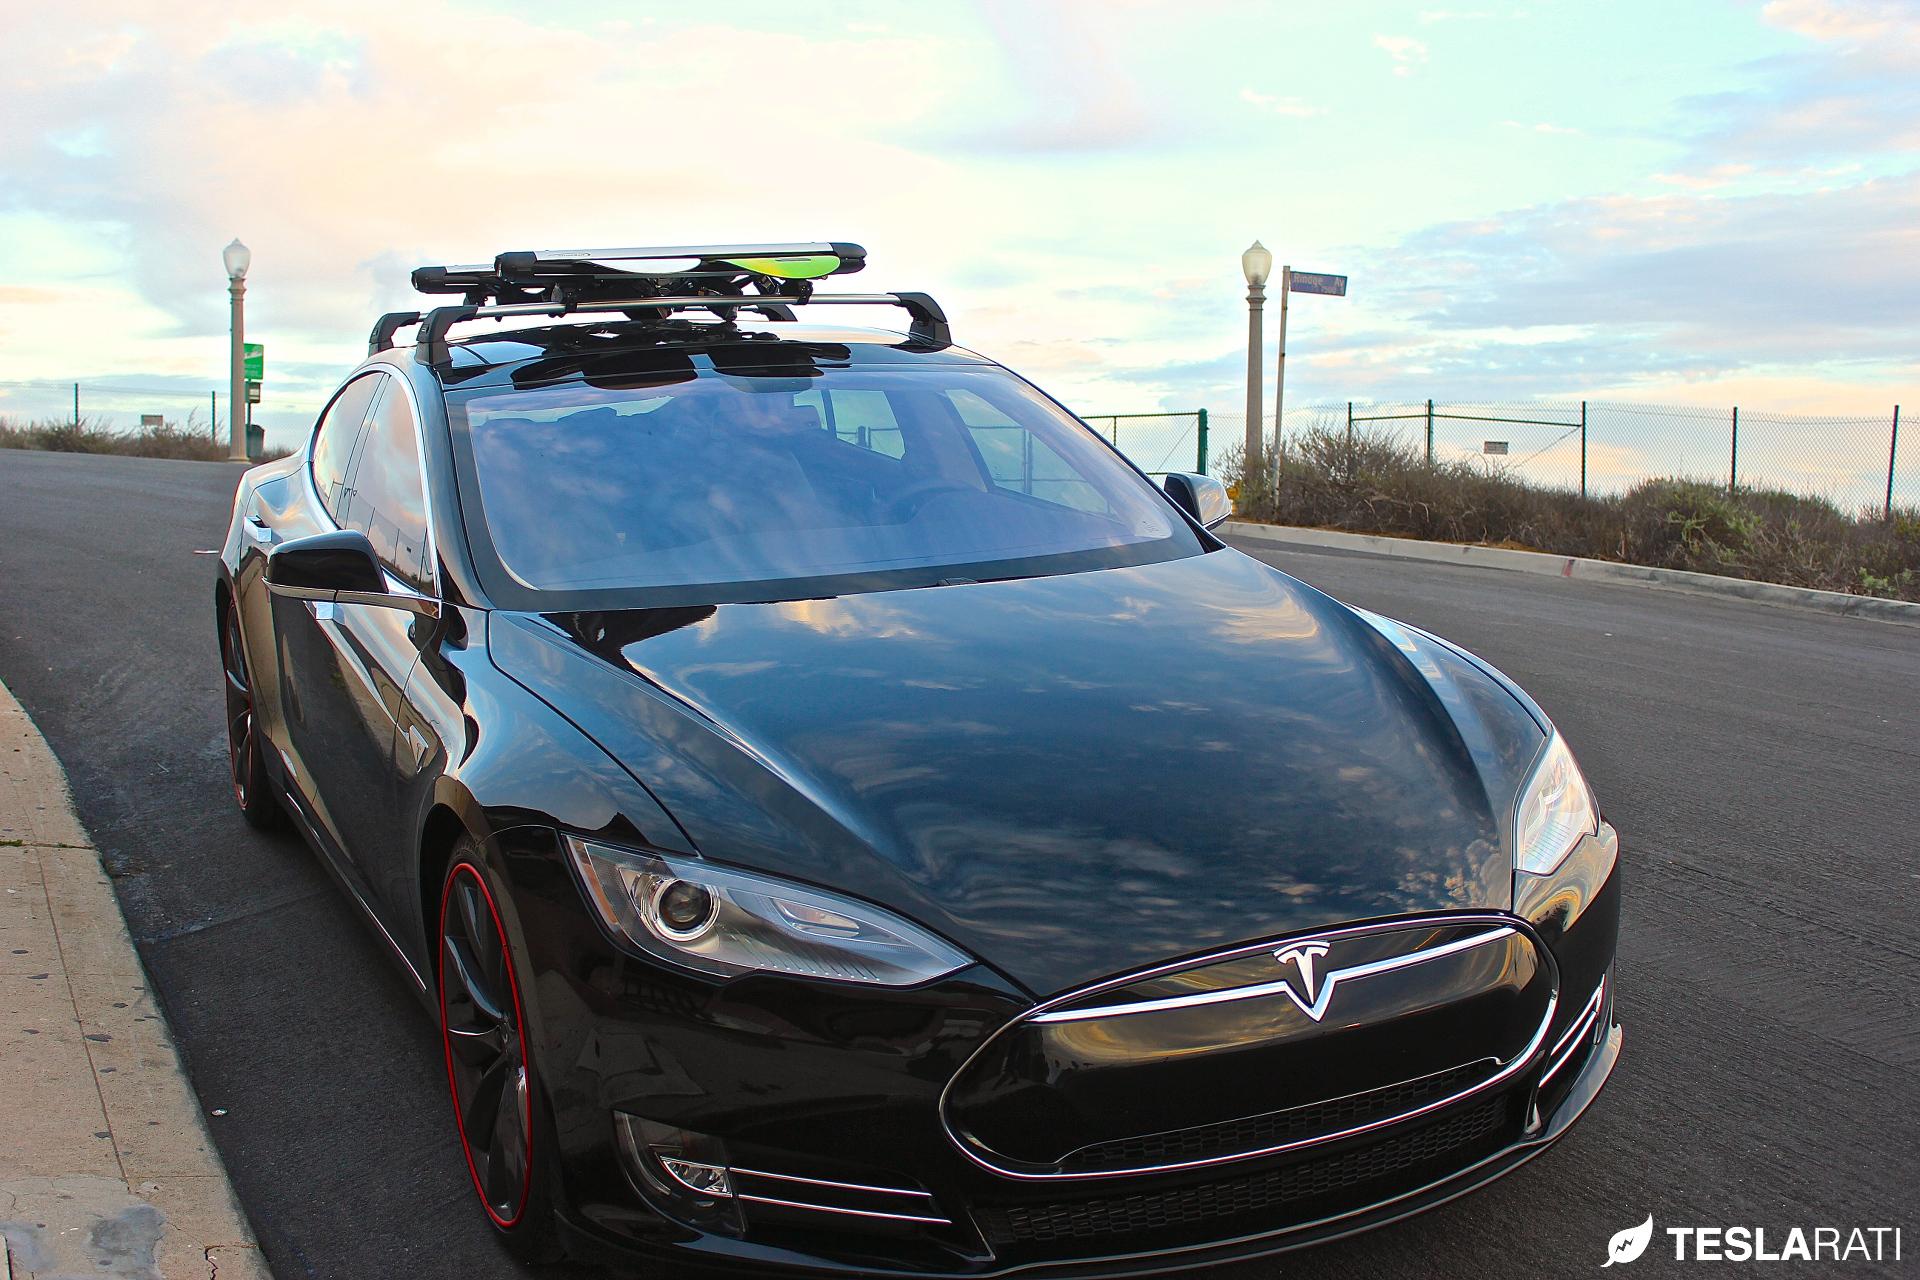 Tesla Model S Whispbar Snow Mount Front Teslaraticom